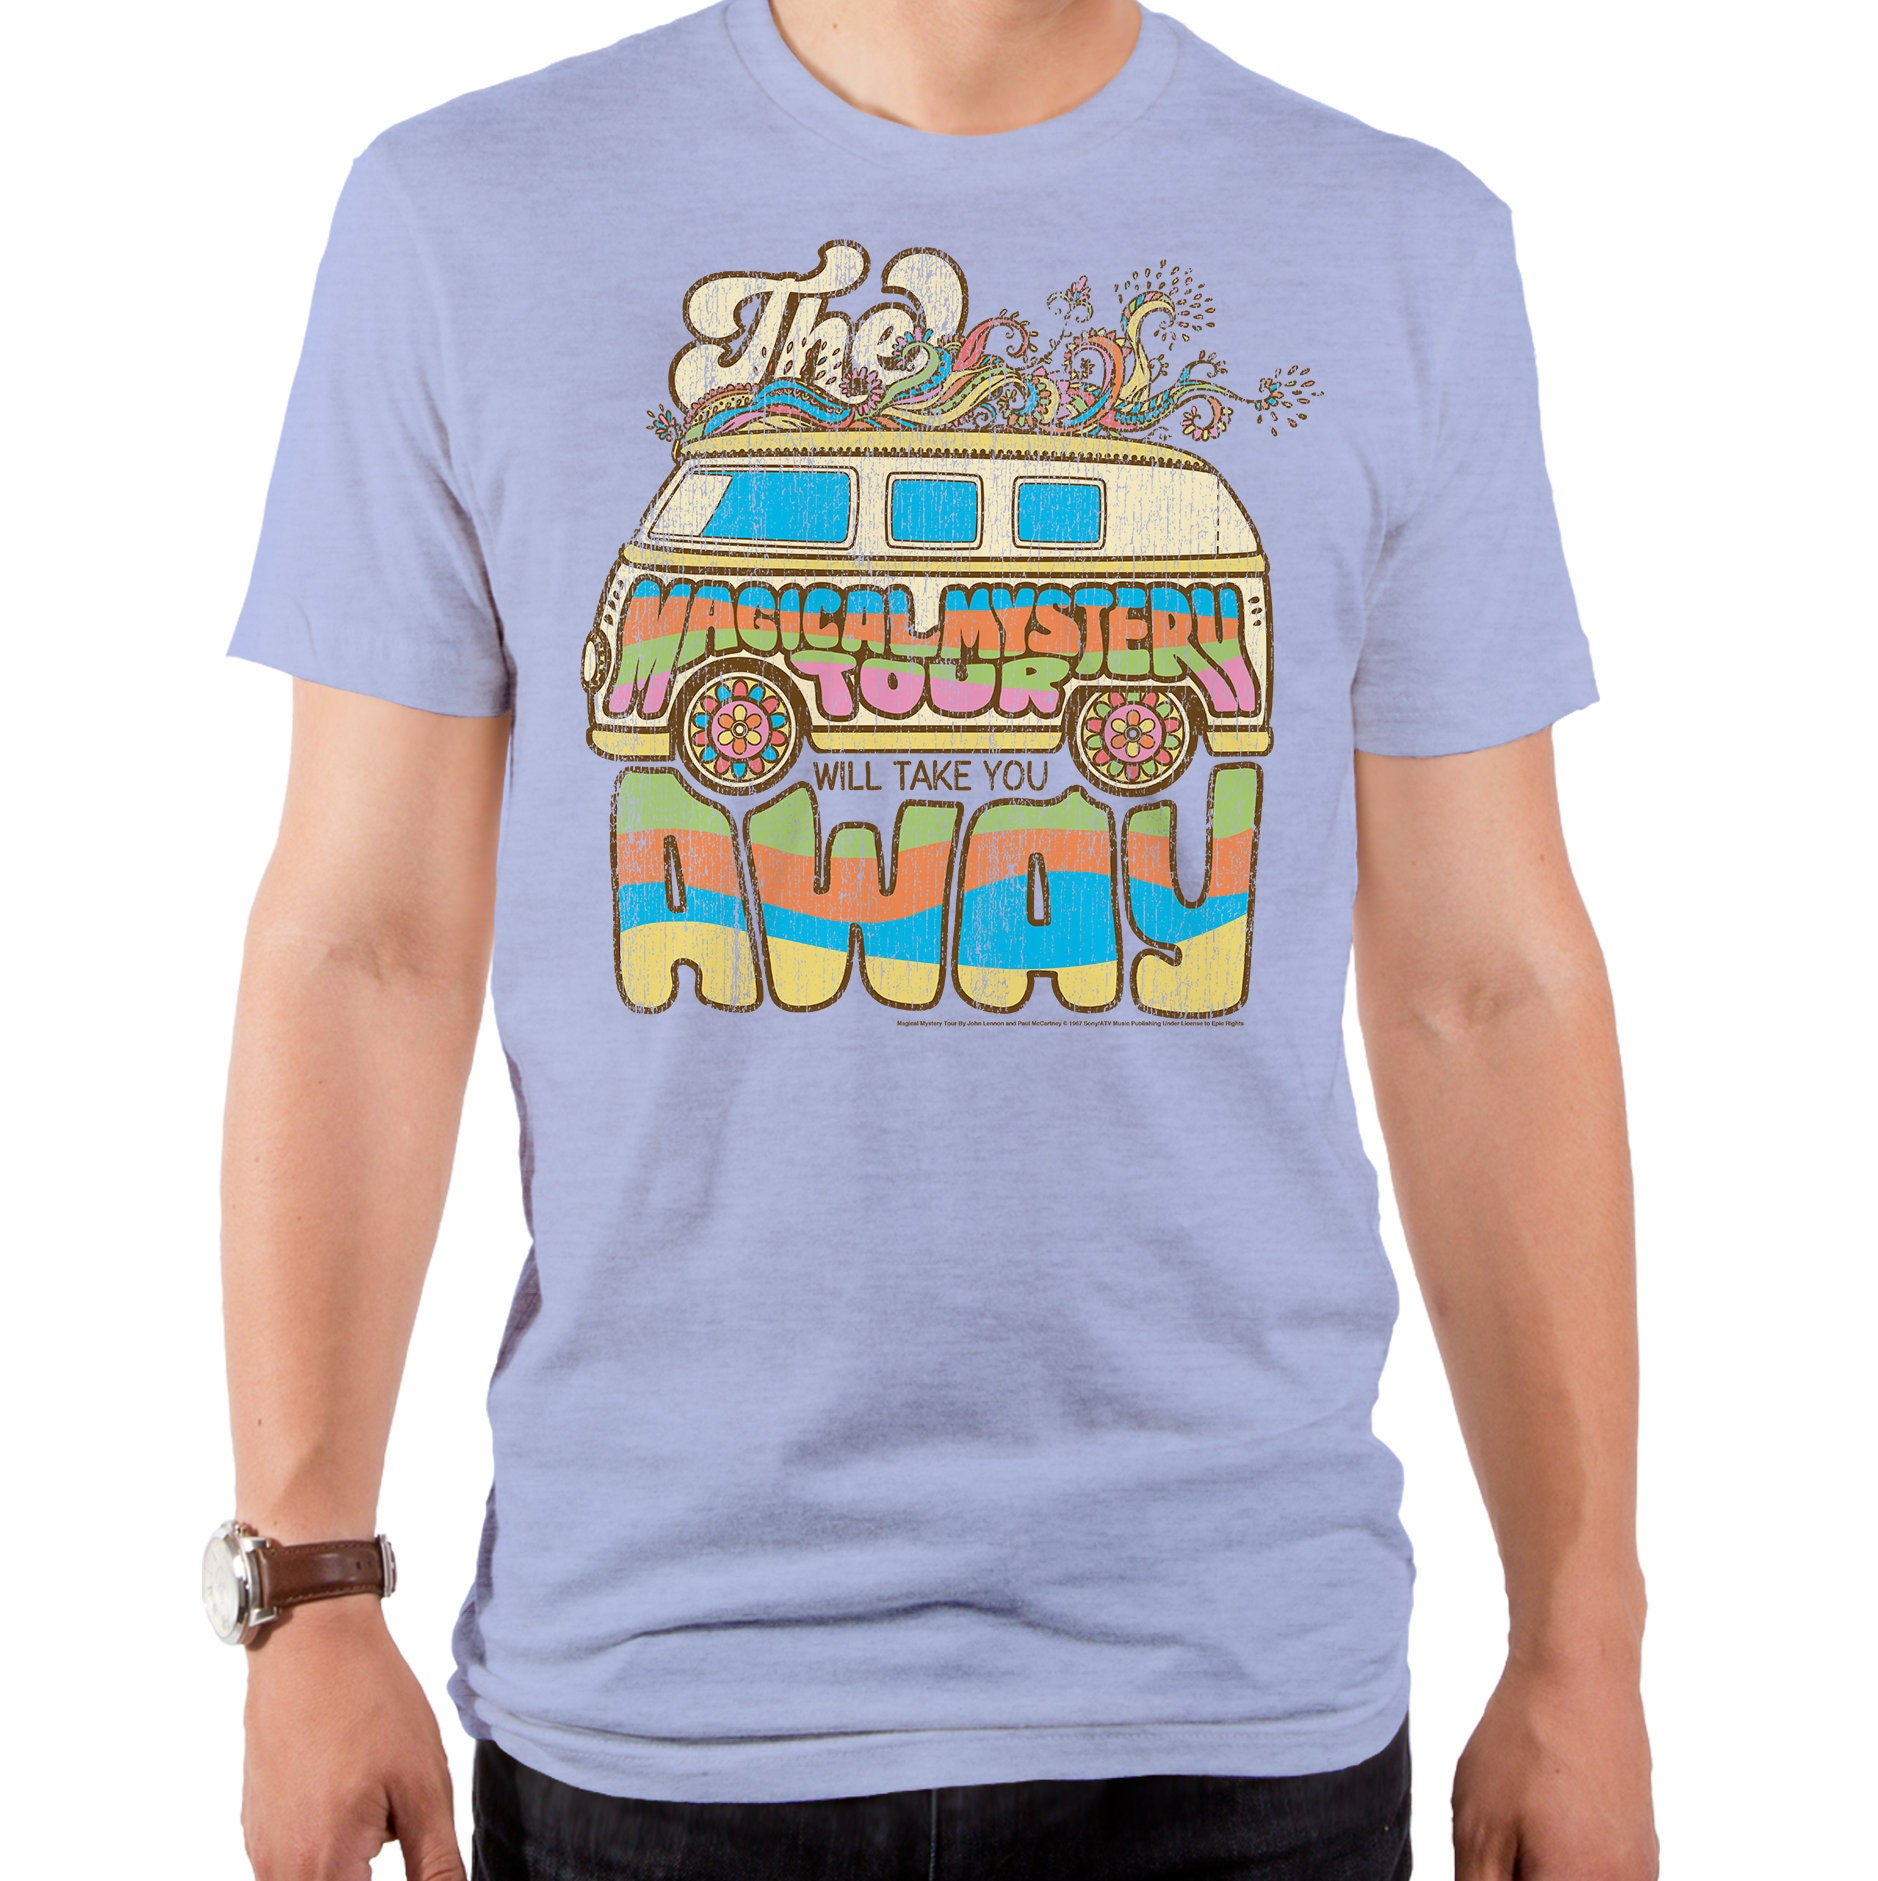 1960s – 70s Men's Ties | Skinny Ties, Slim Ties Magical Mystery Tour Mens T-Shirt  Llm0001-511Orh Lennon  Mccartney, Music, Lyrics, English Musicians, 1960S Compositions $27.95 AT vintagedancer.com